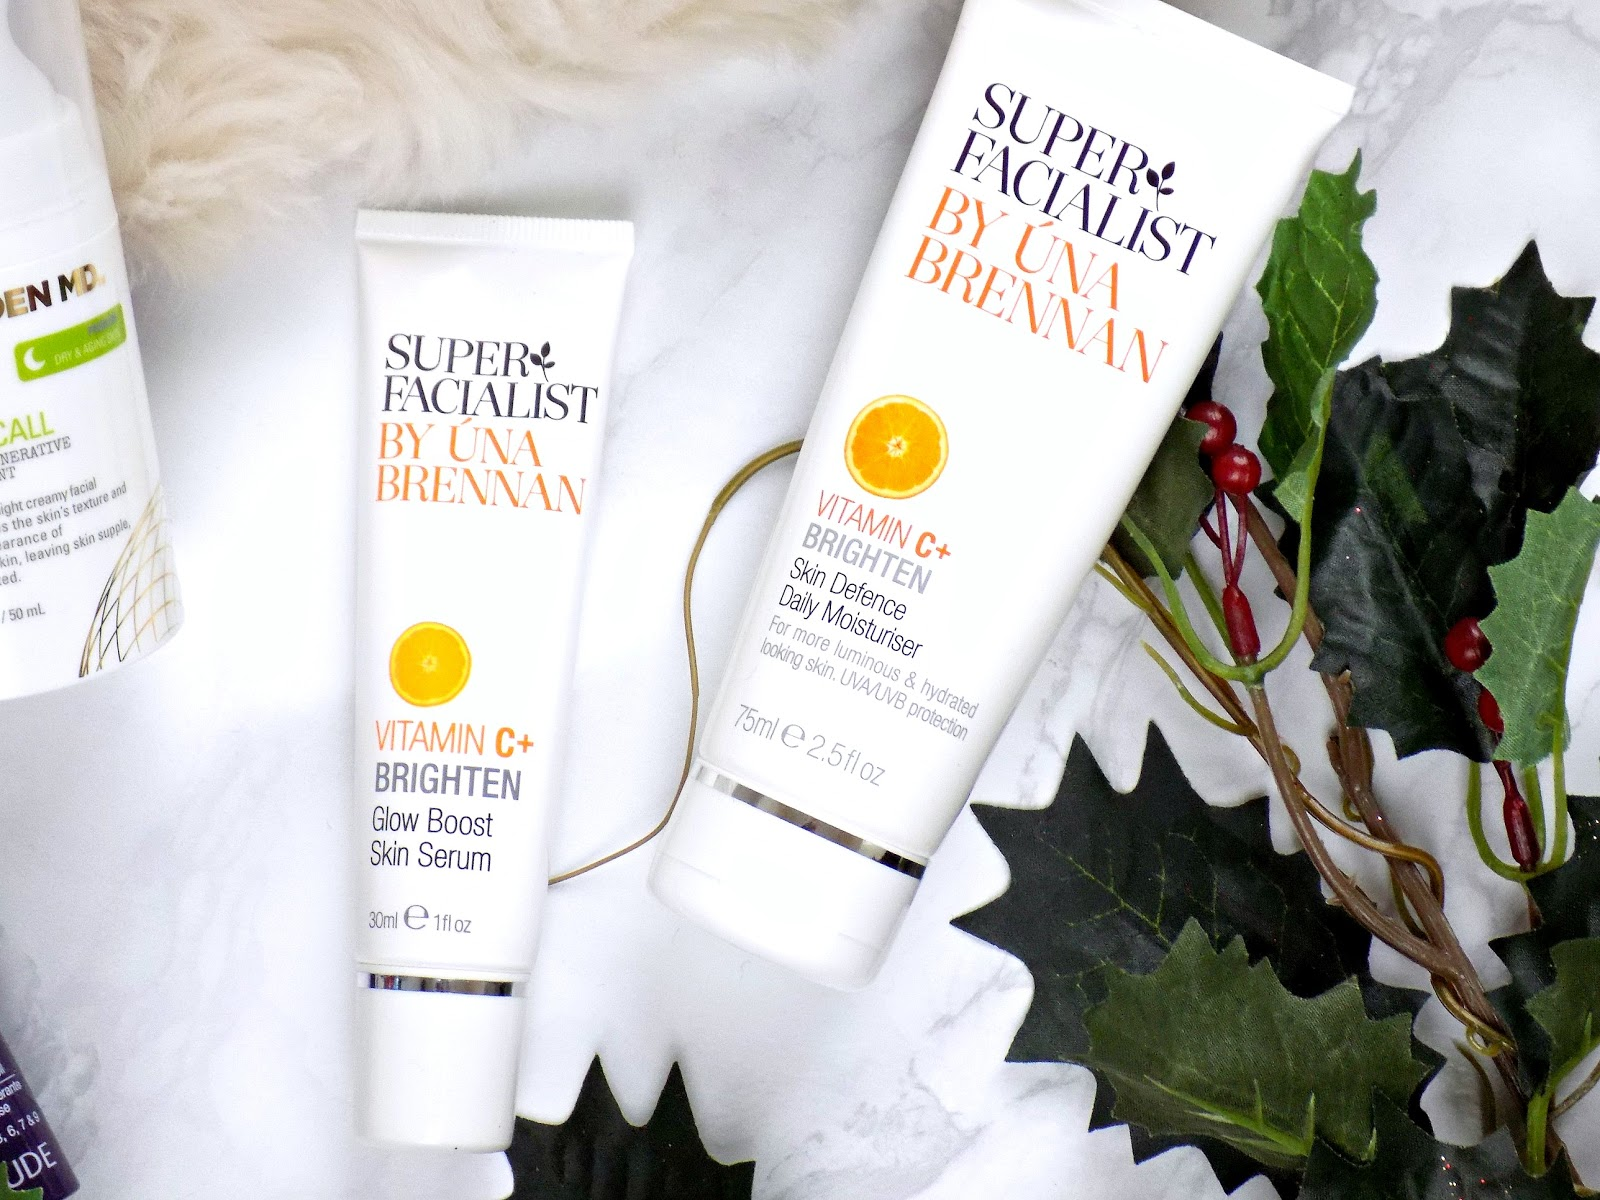 super facialist vitamin C+ brighten serum and moisturiser